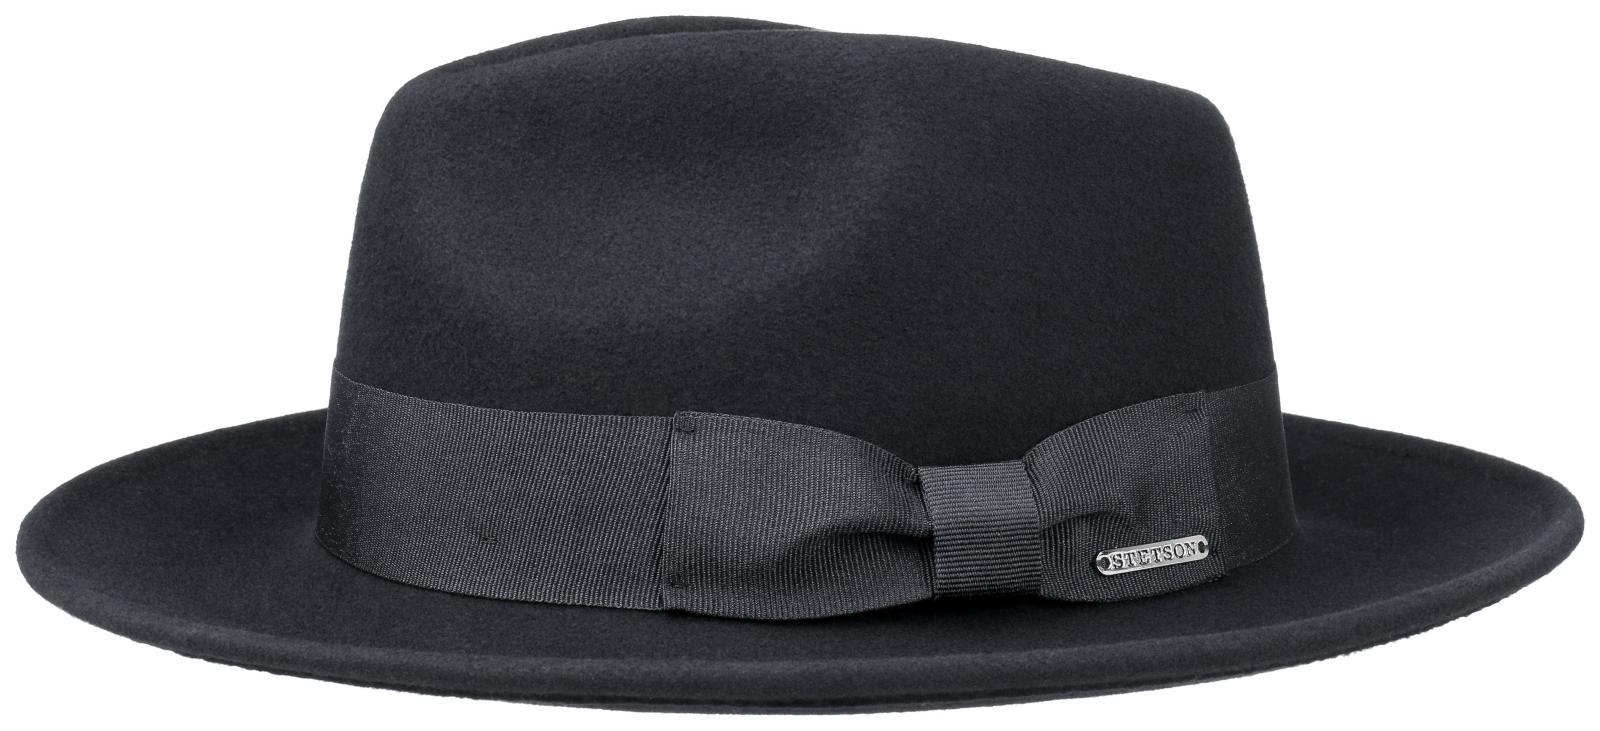 Stetson Fedora Wool - Cashmere Black Hat